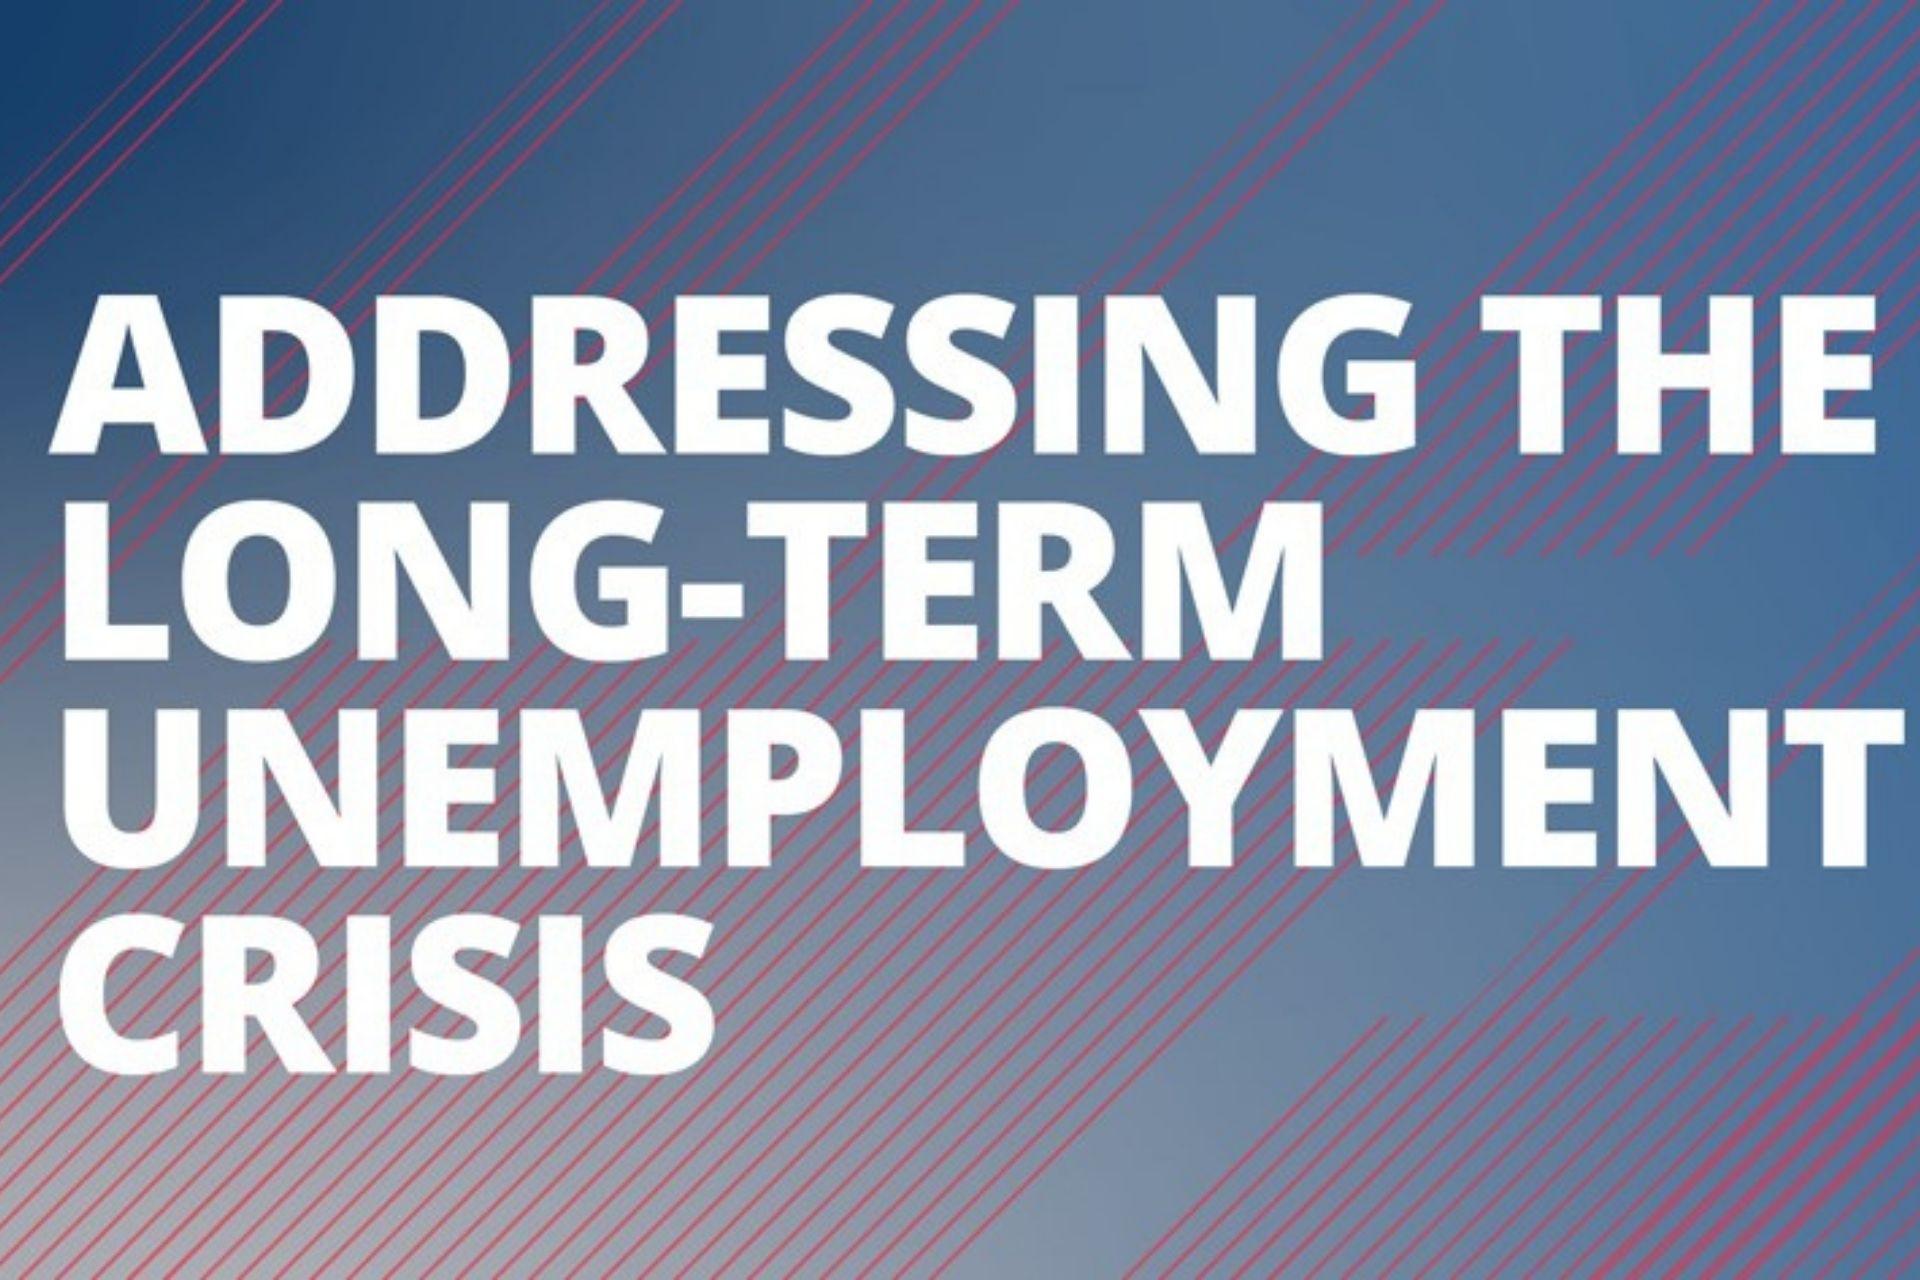 Addressing the long-term unemployment crisis